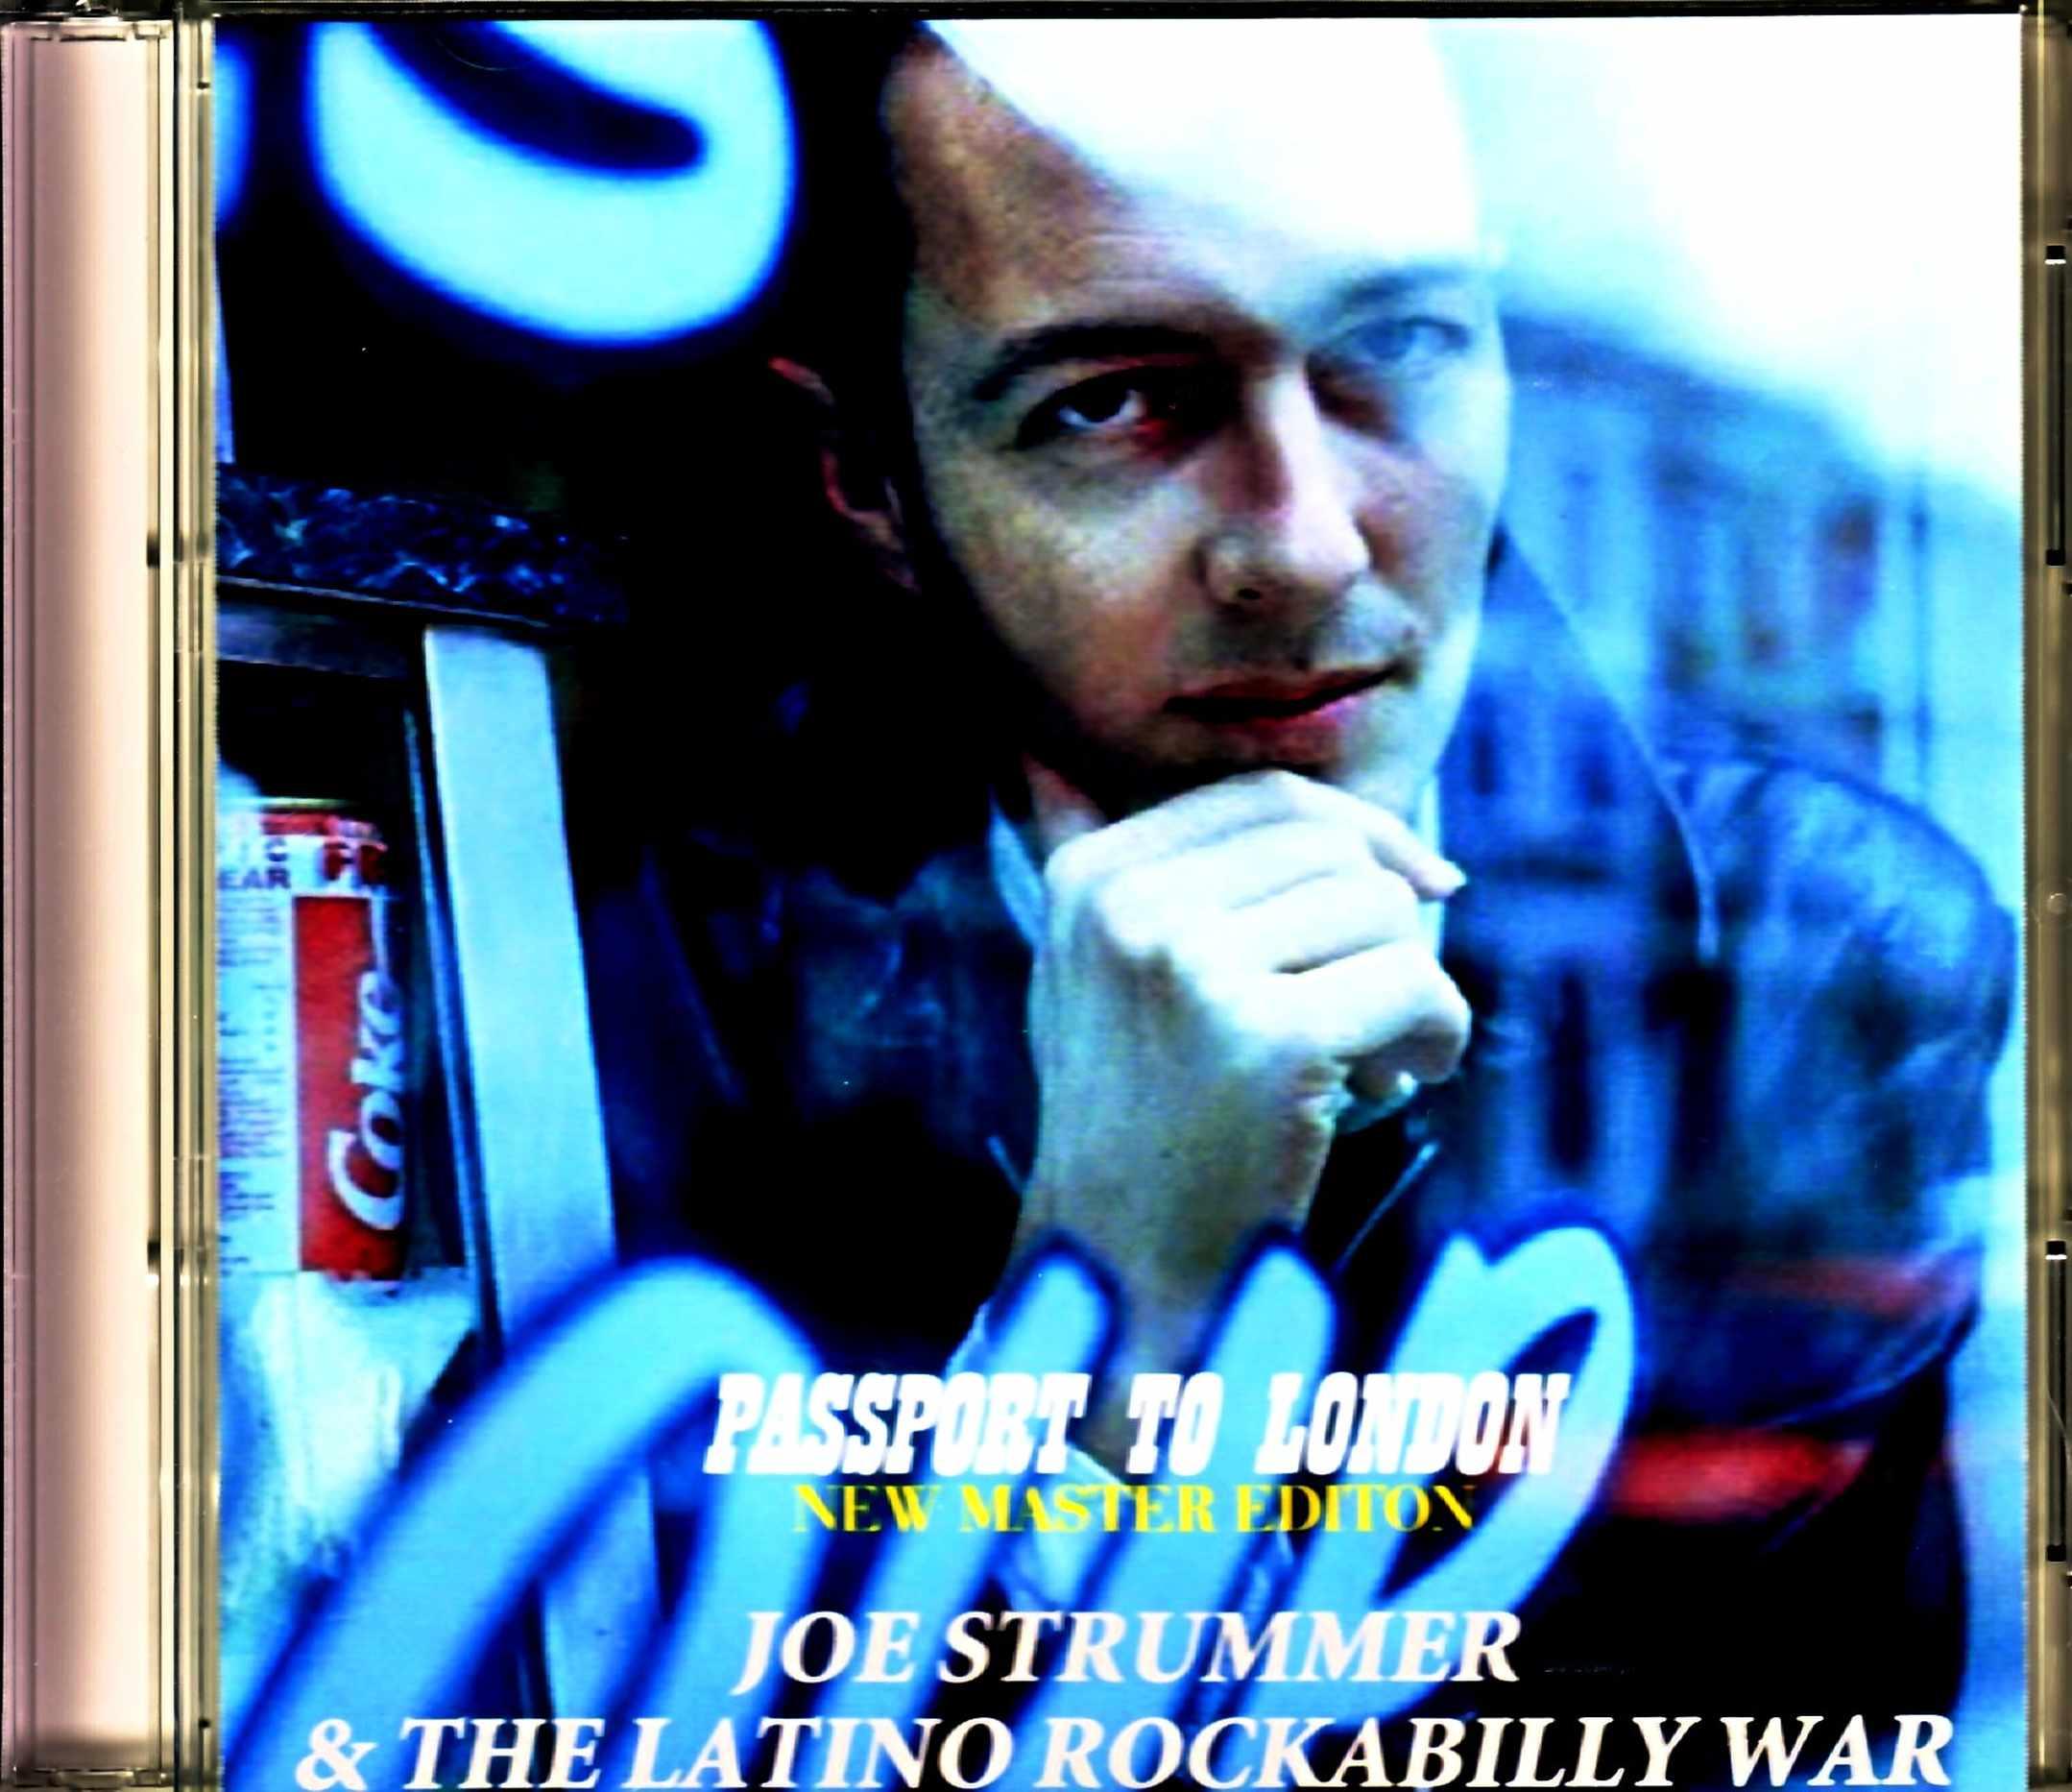 Joe Strummer & the Latino Rockabilly War ジョー・ストラマー/London,UK 1989 Complete